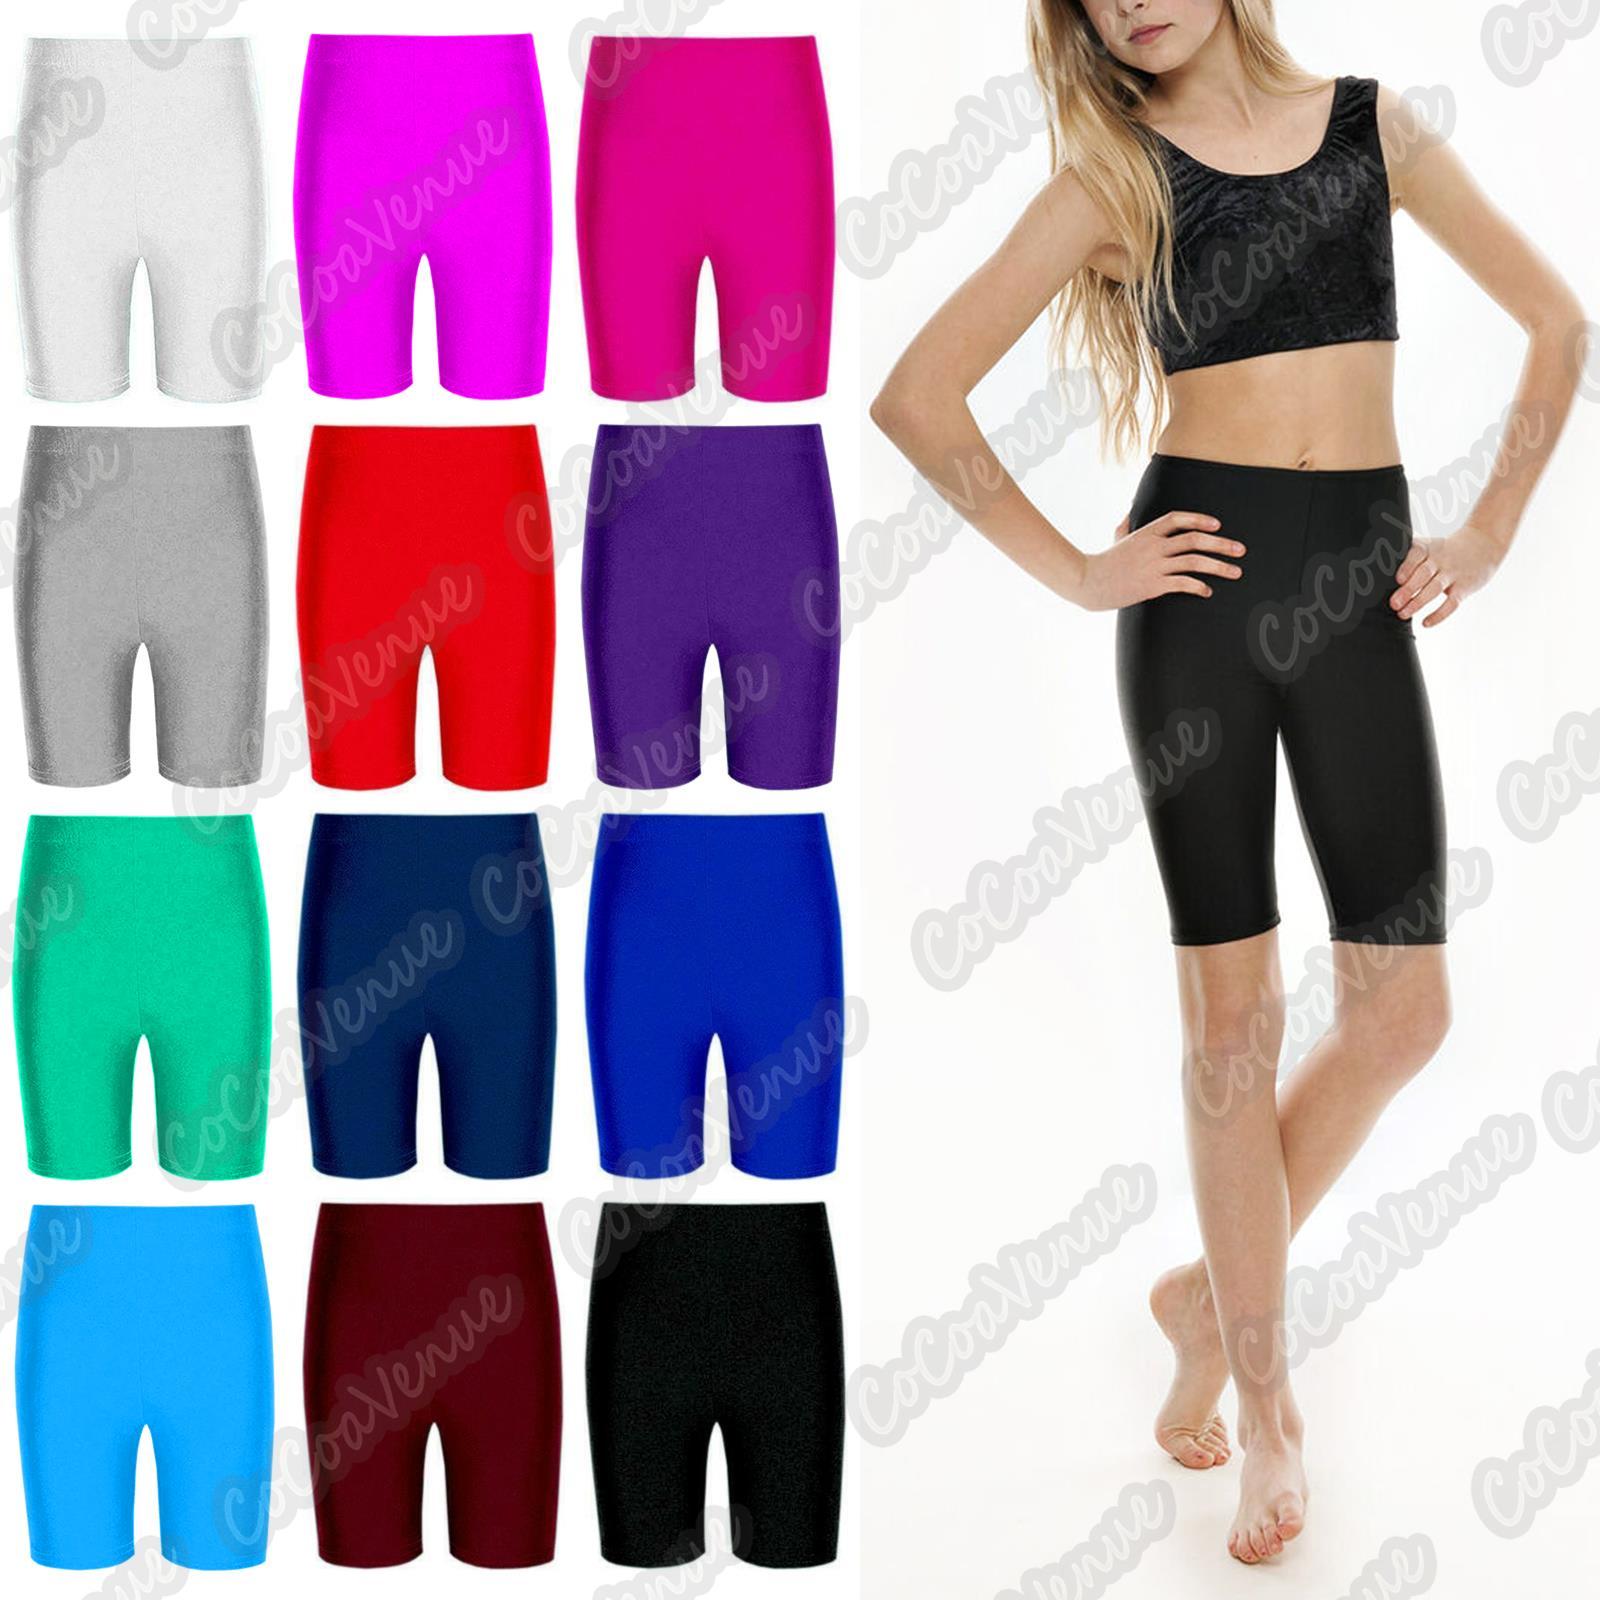 Girls Lycra Shorts Cycling Dance Sports P.E School Shorts SALE ON All Size £3.99